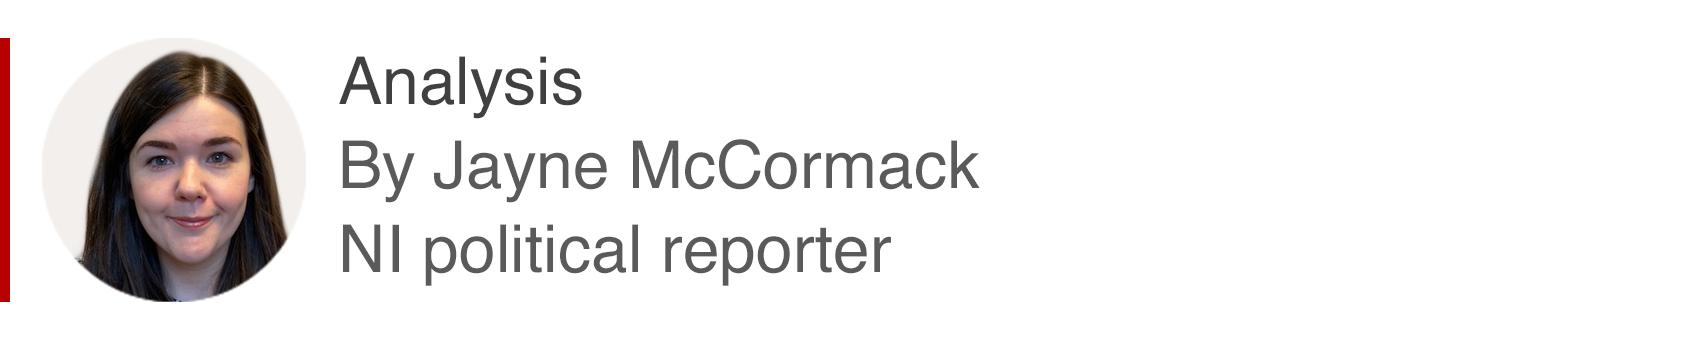 Analysis box by Jayne McCormack, NI political reporter